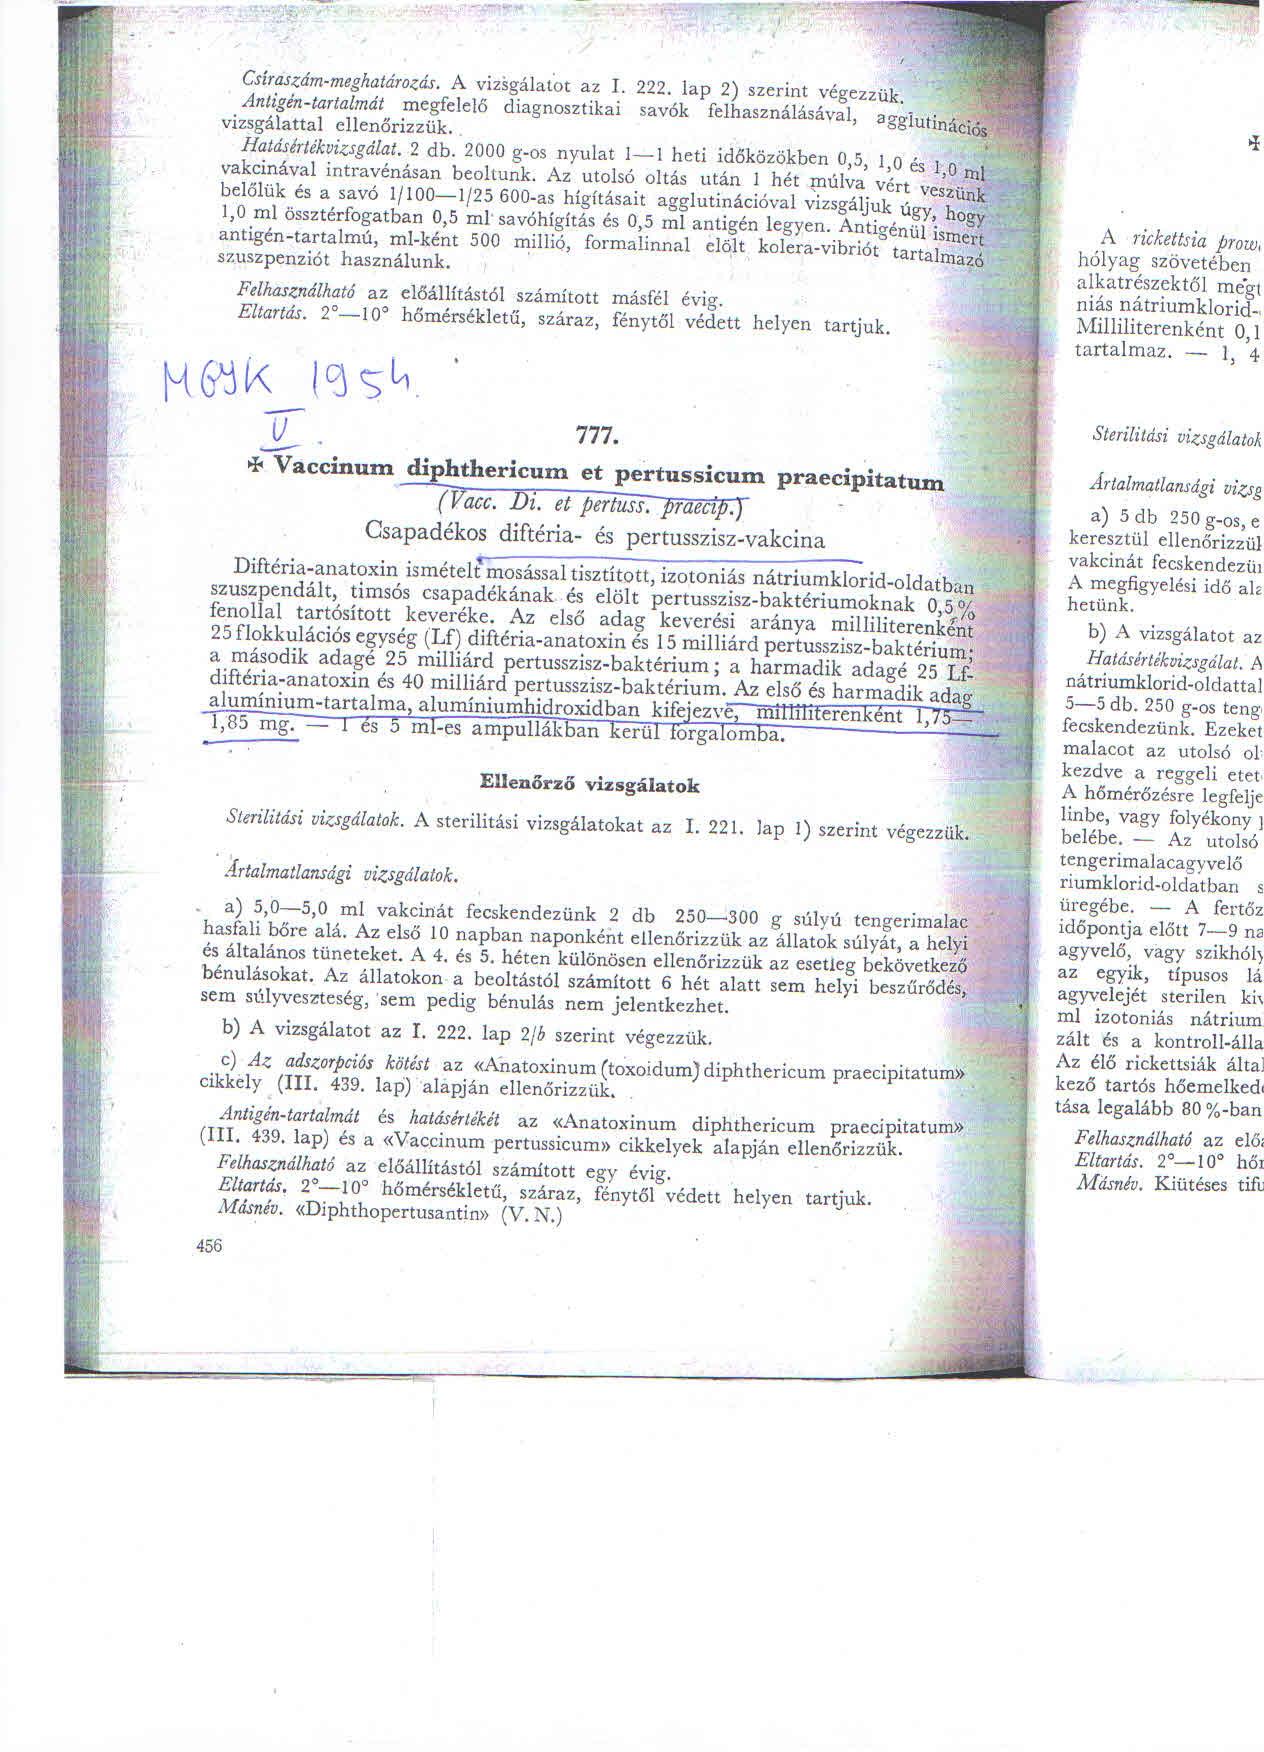 magyar_gyogyszerkonyv_1954_2.jpg